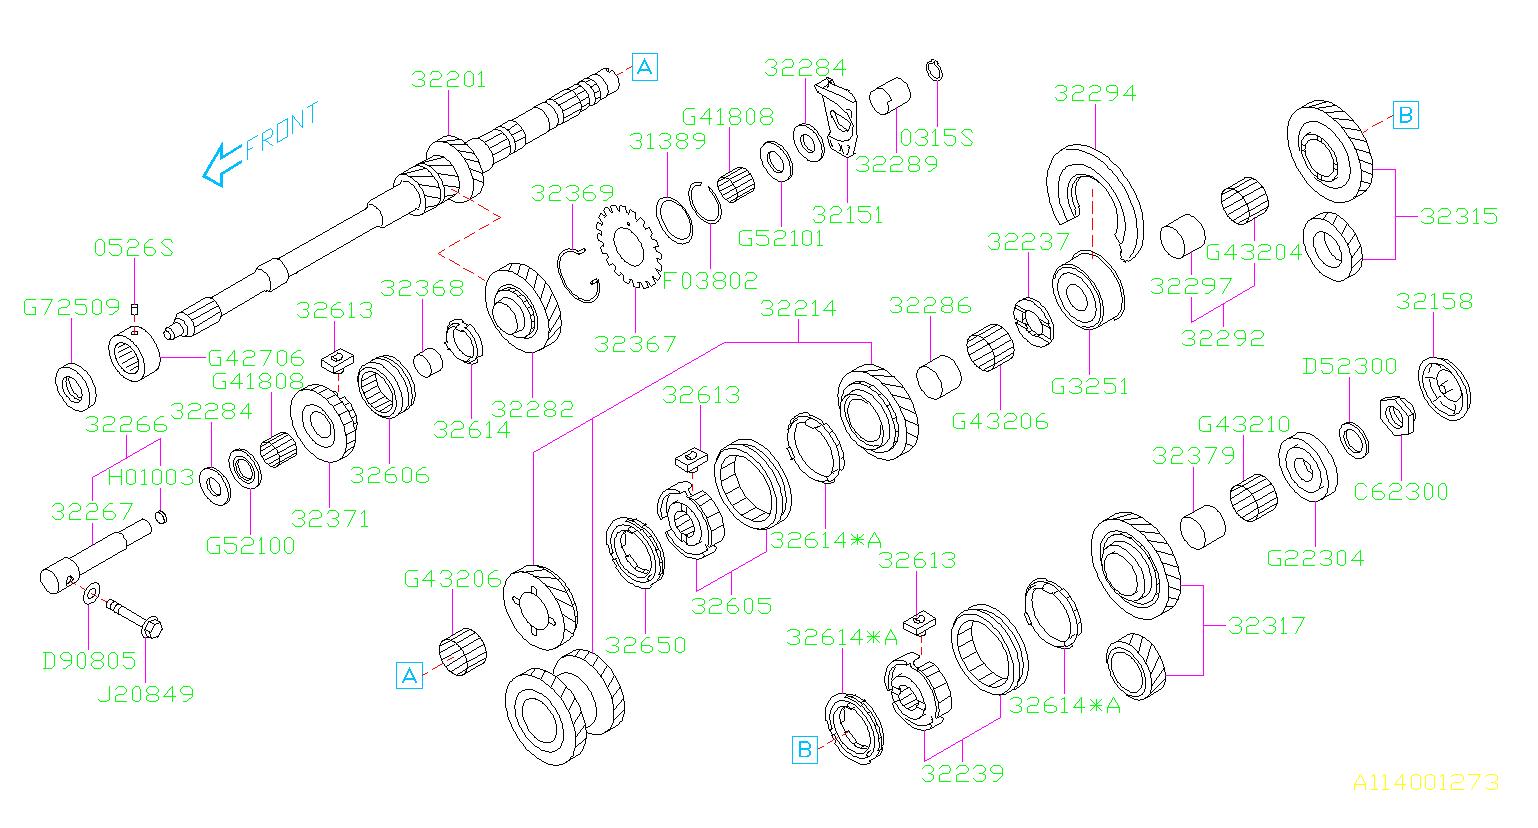 2013 Subaru Outback Manual Transmission Idler Bearing ...